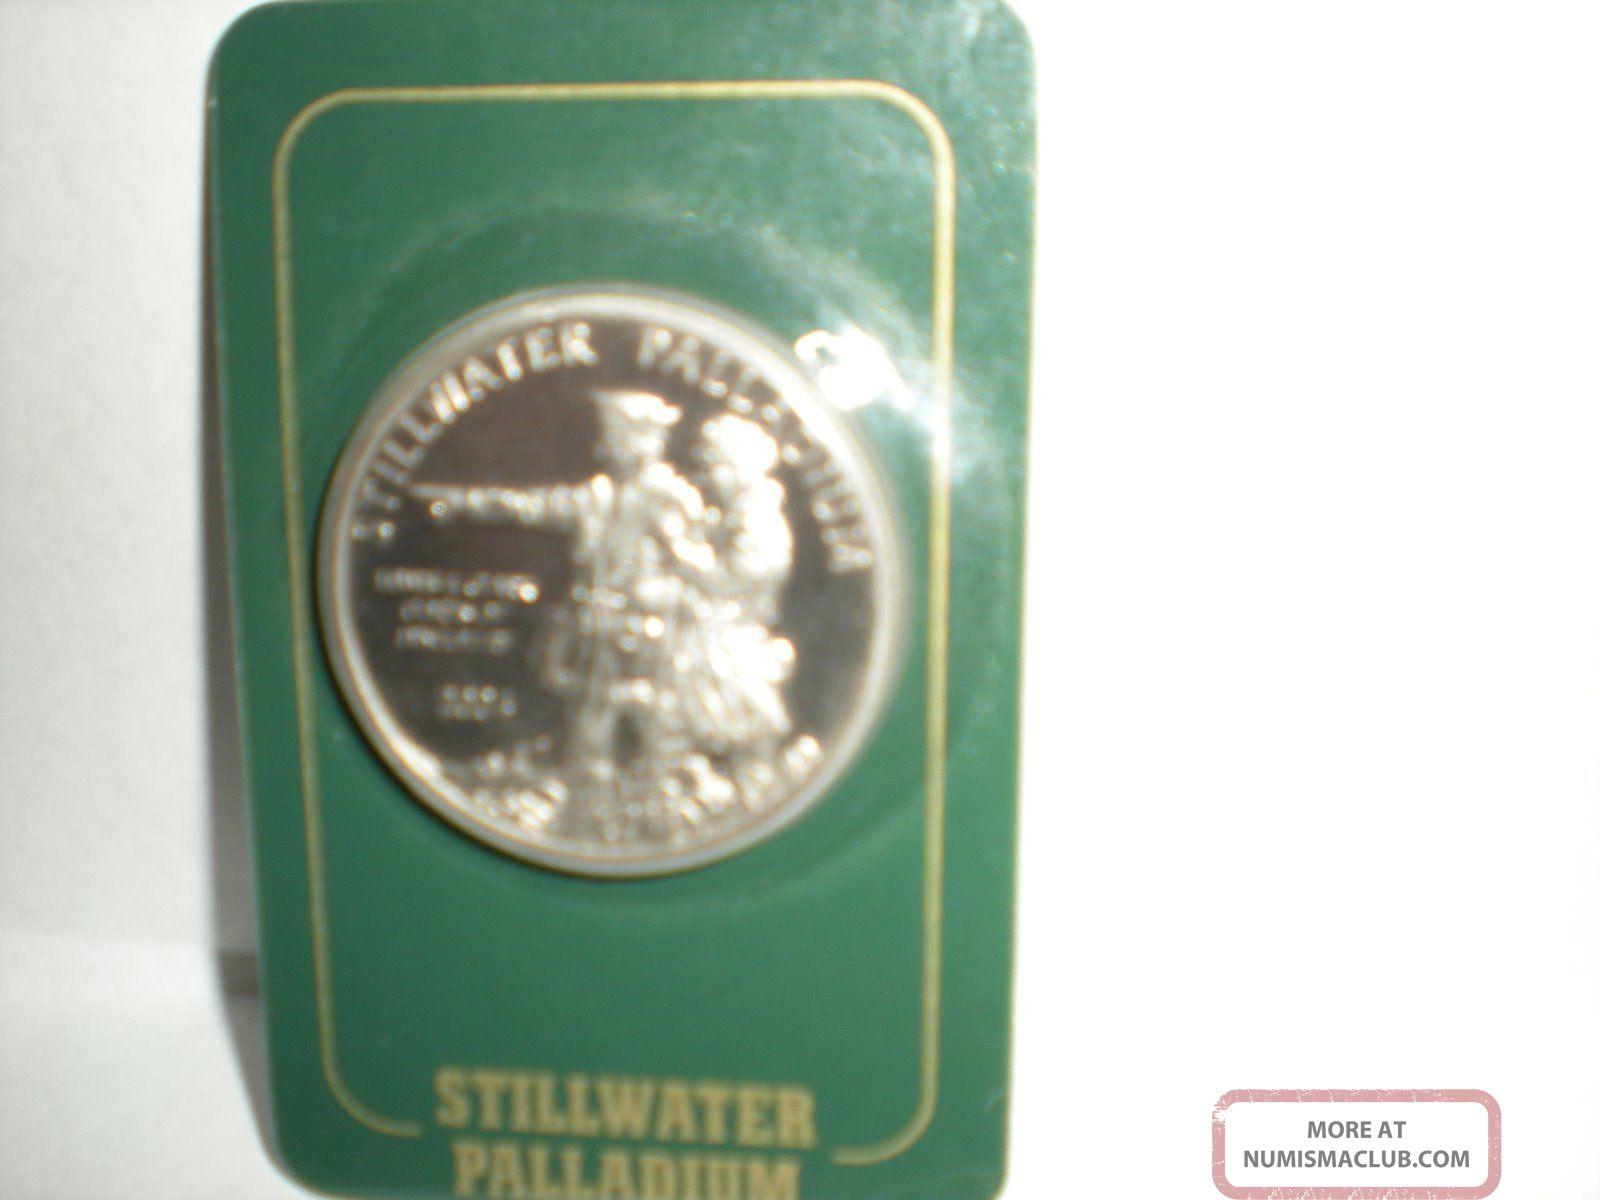 2004 Stillwater Palladium One Ounce Coin Lewis & Clark Bullion photo